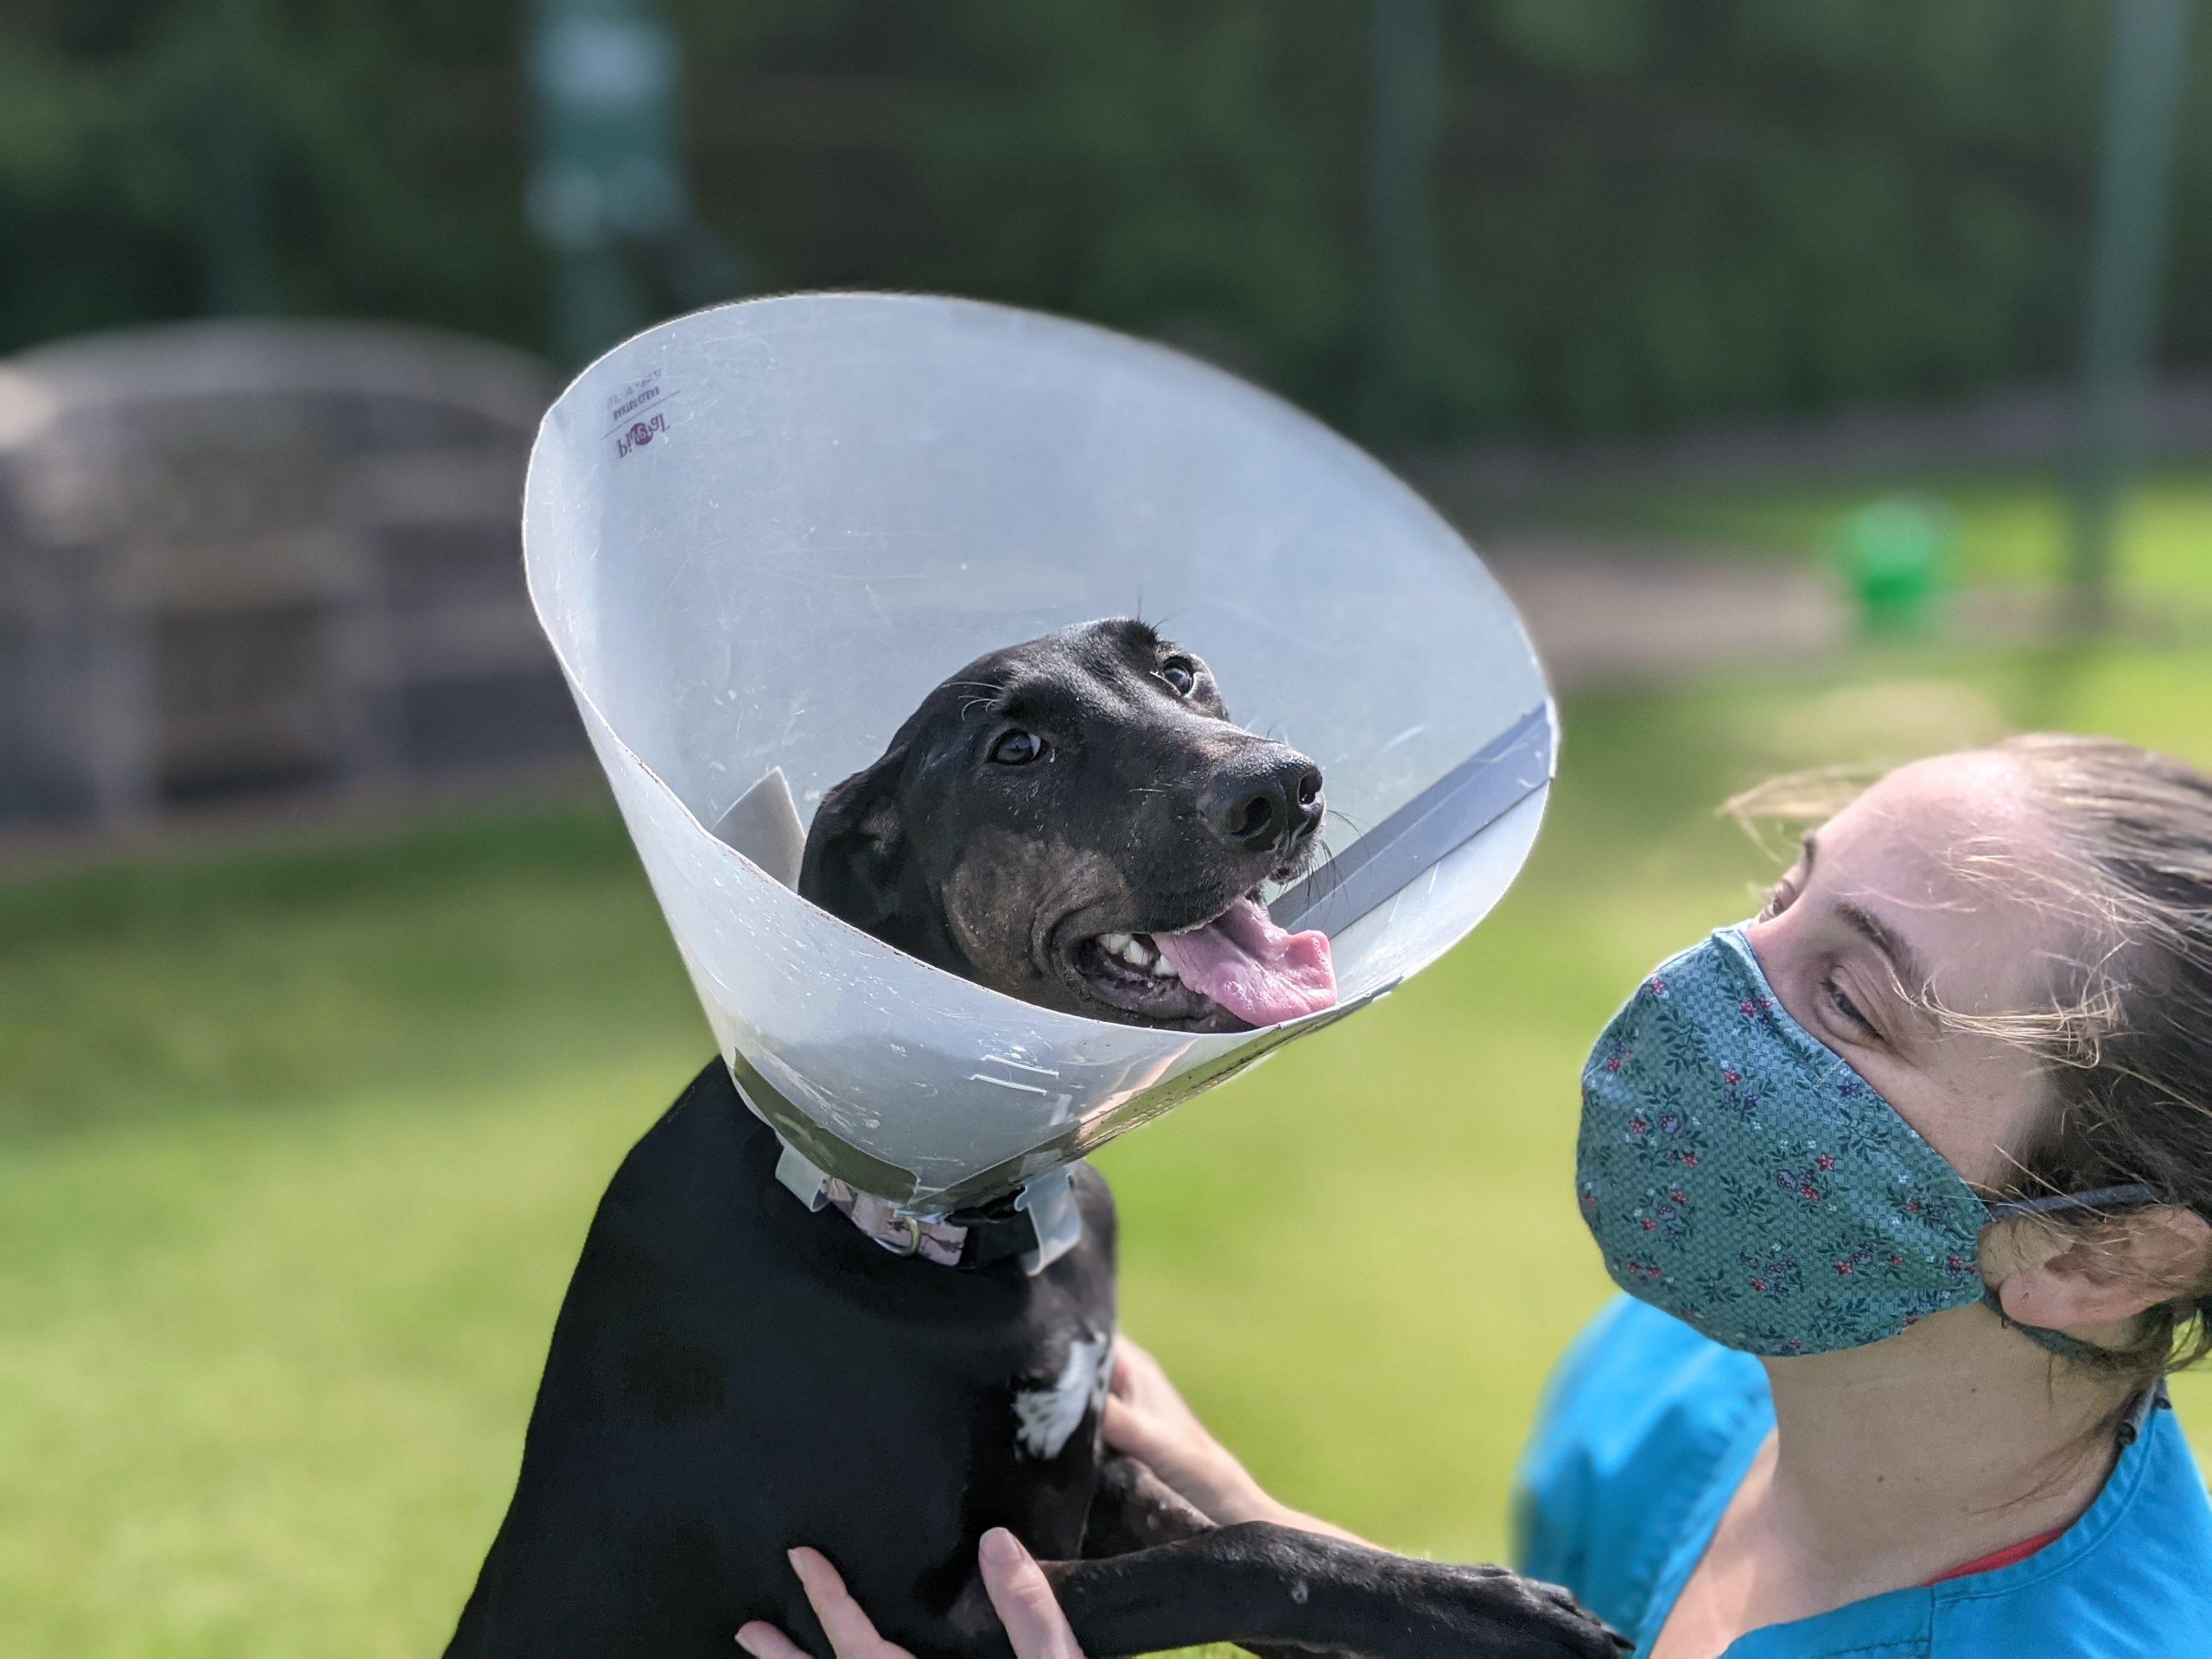 Dog Hit By Car And Shot Is Inspiration at Maui Humane Society